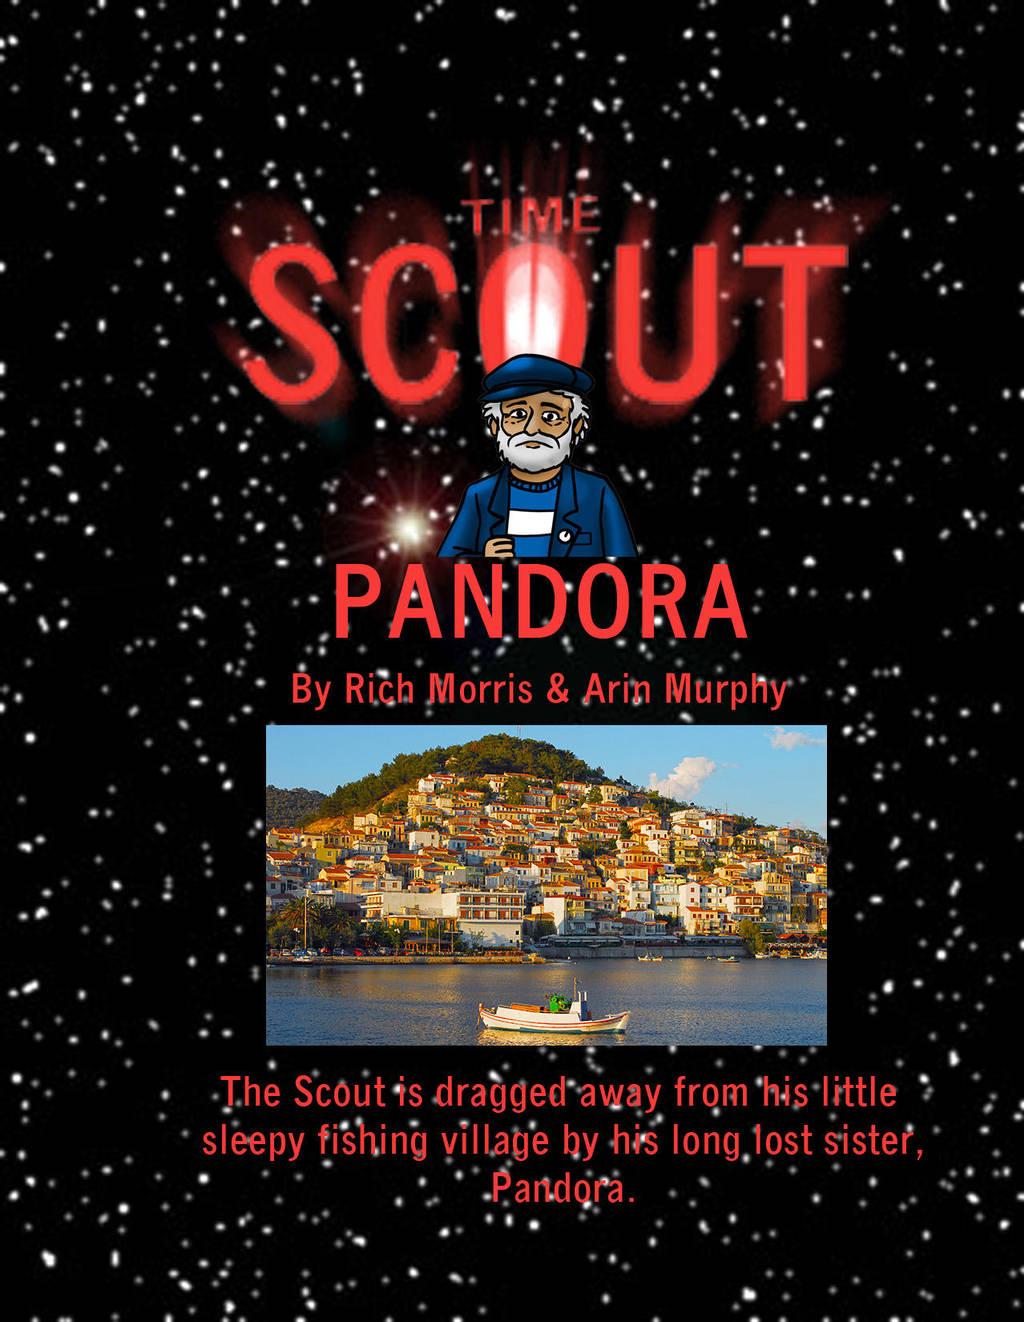 Pandora by Gorpo